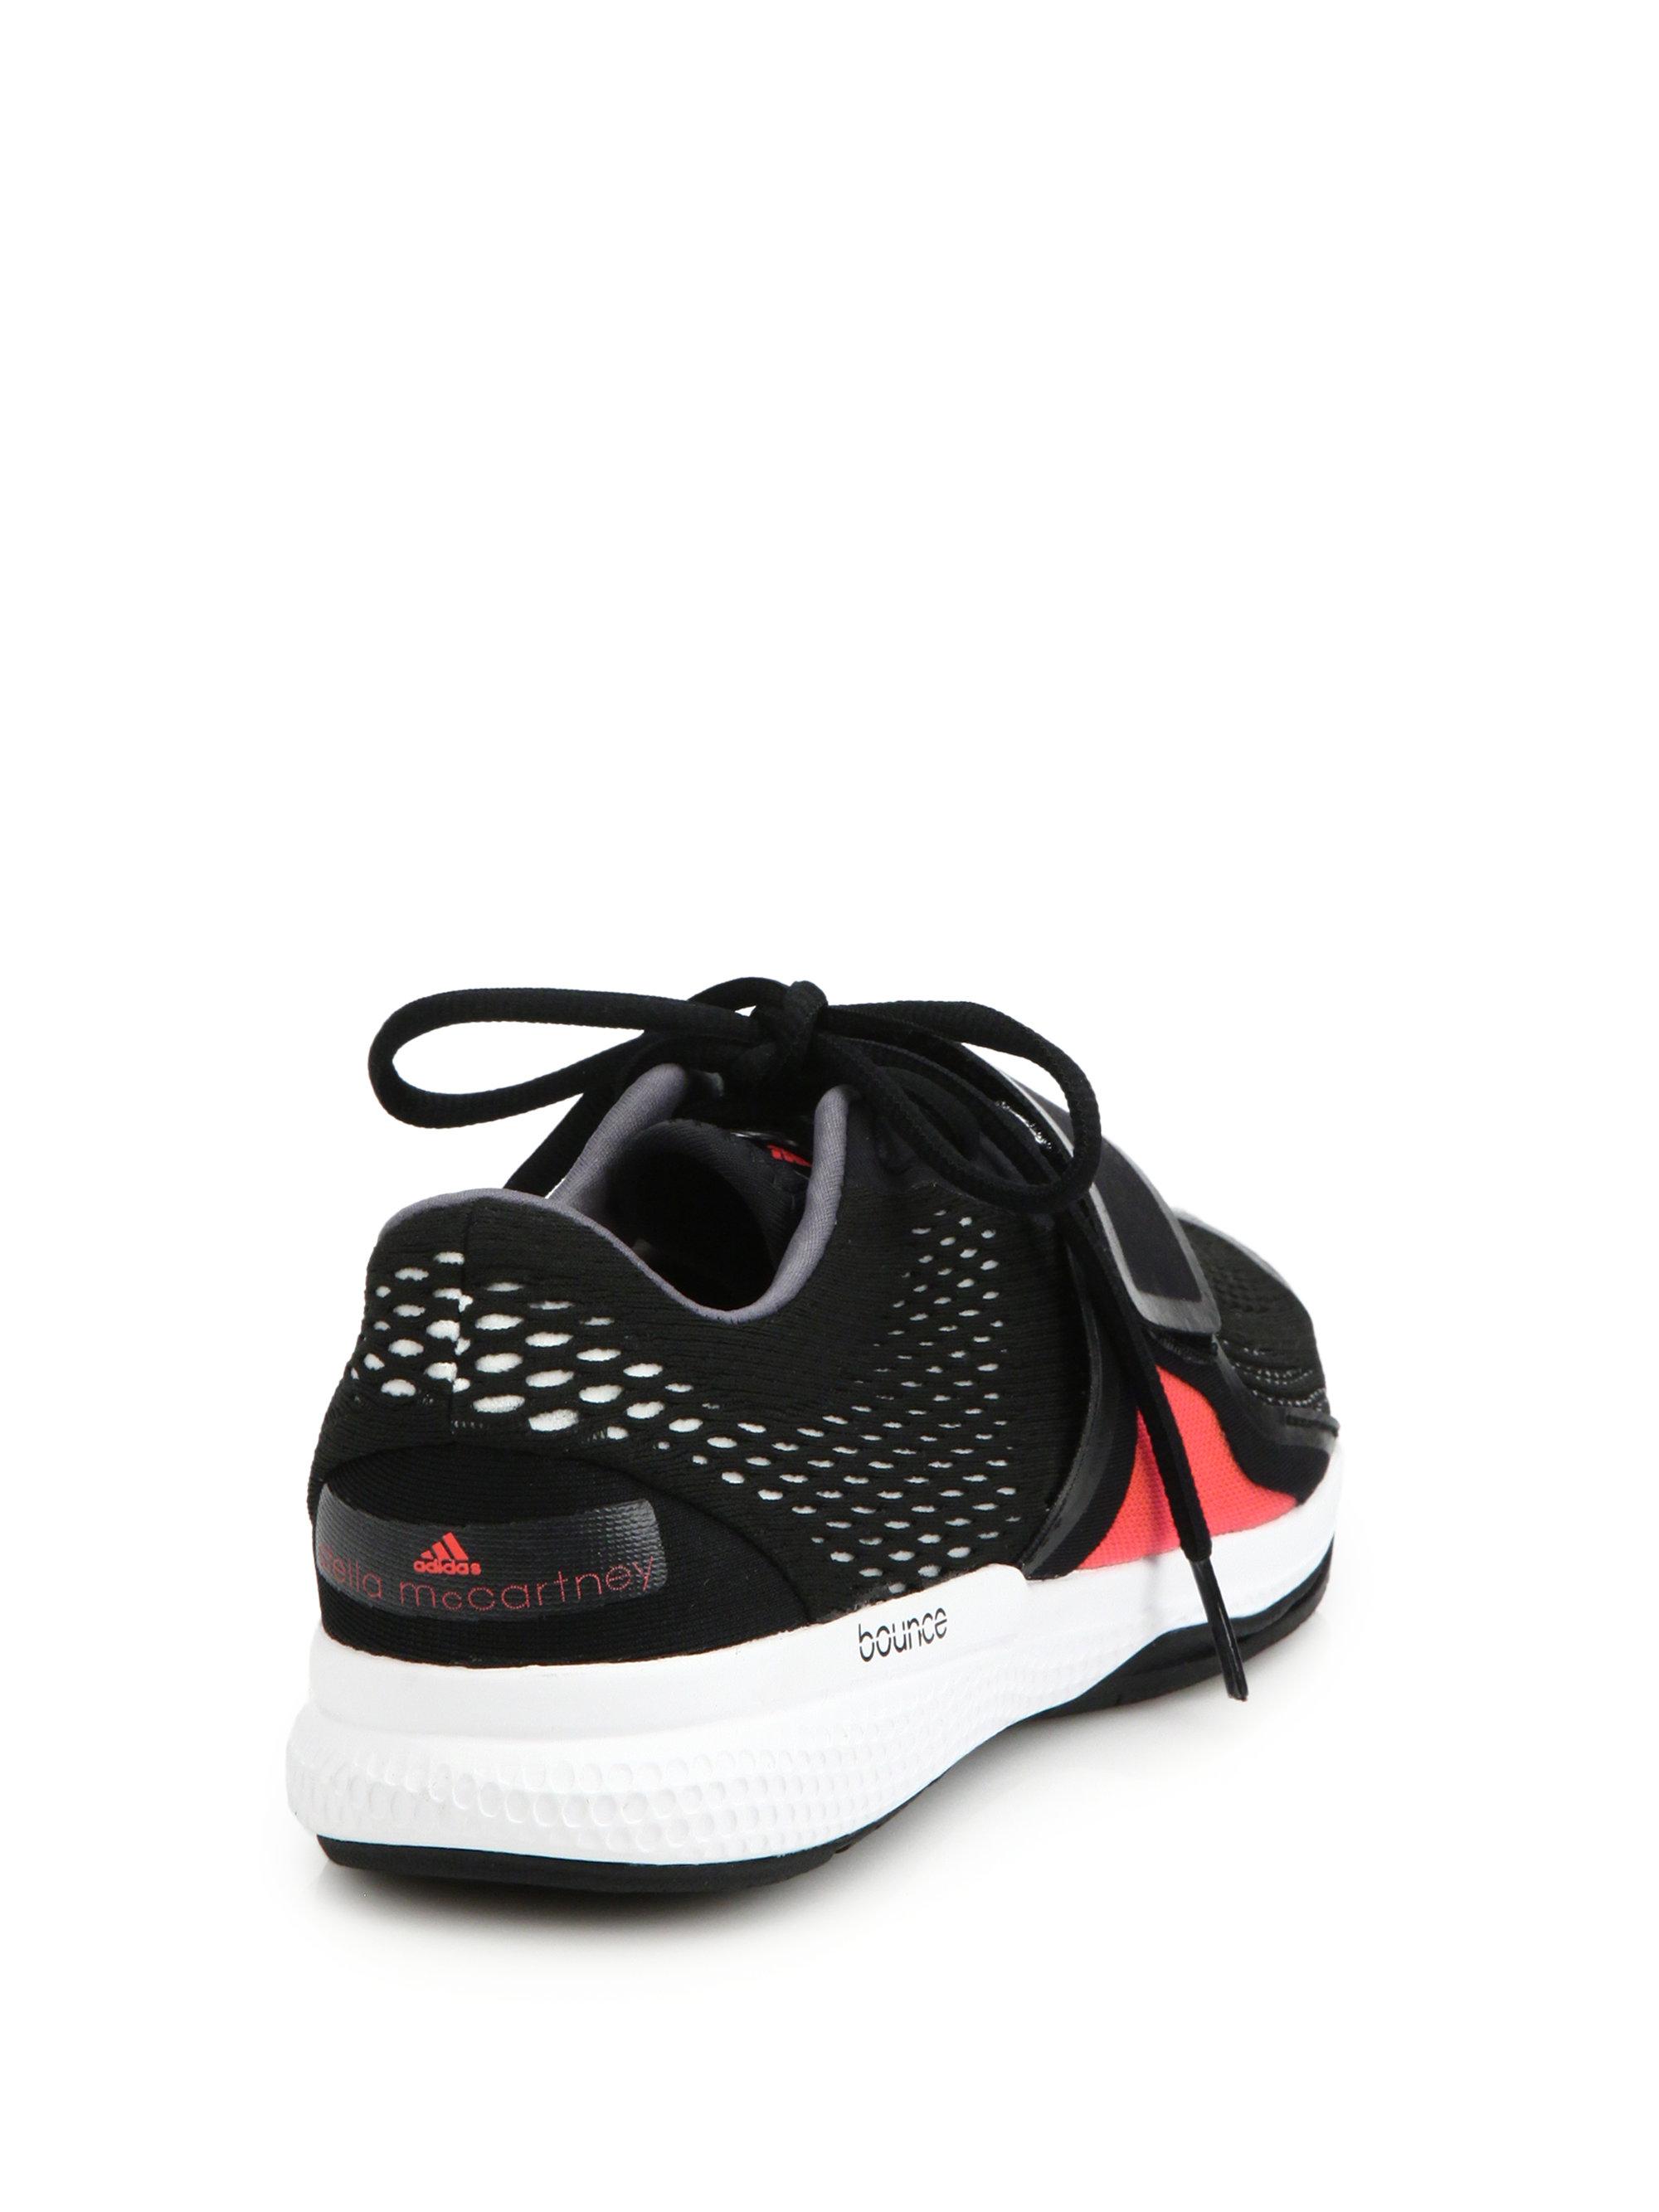 newest 2b346 a61c7 Lyst - adidas By Stella McCartney Atani Bounce Sneakers in B